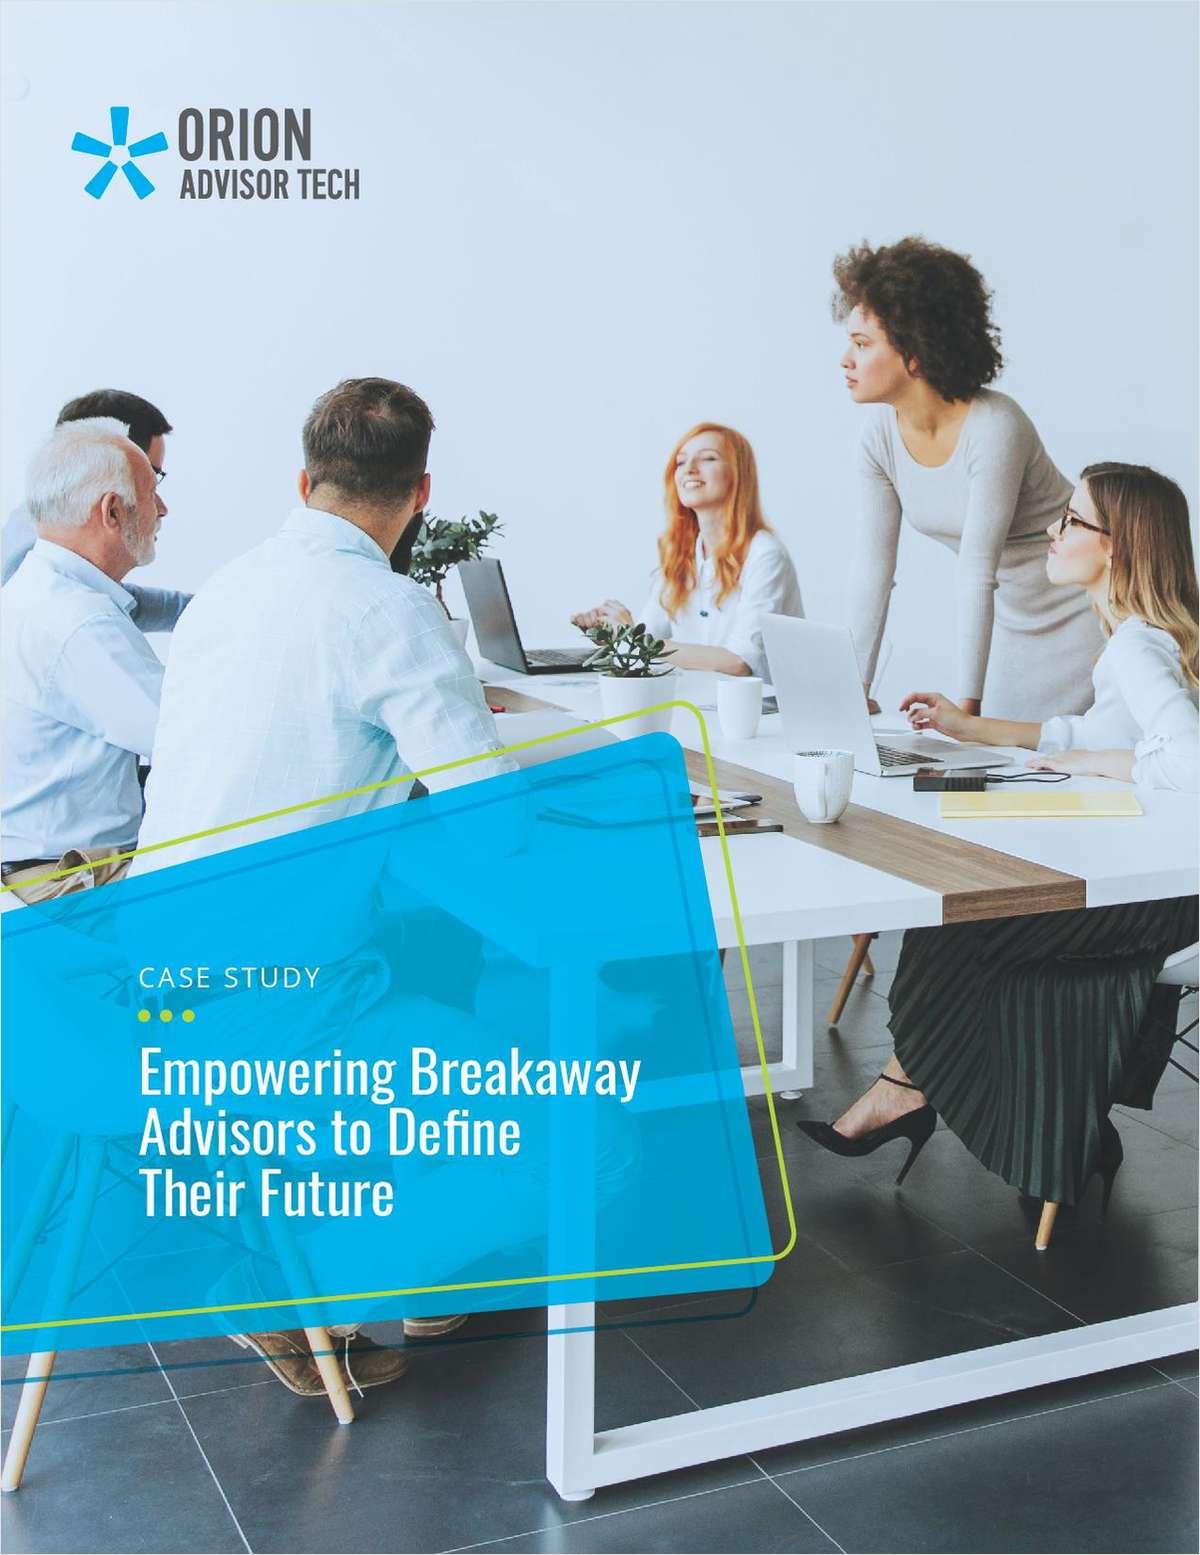 Case Study: Empowering Breakaway Advisors to Define Their Future